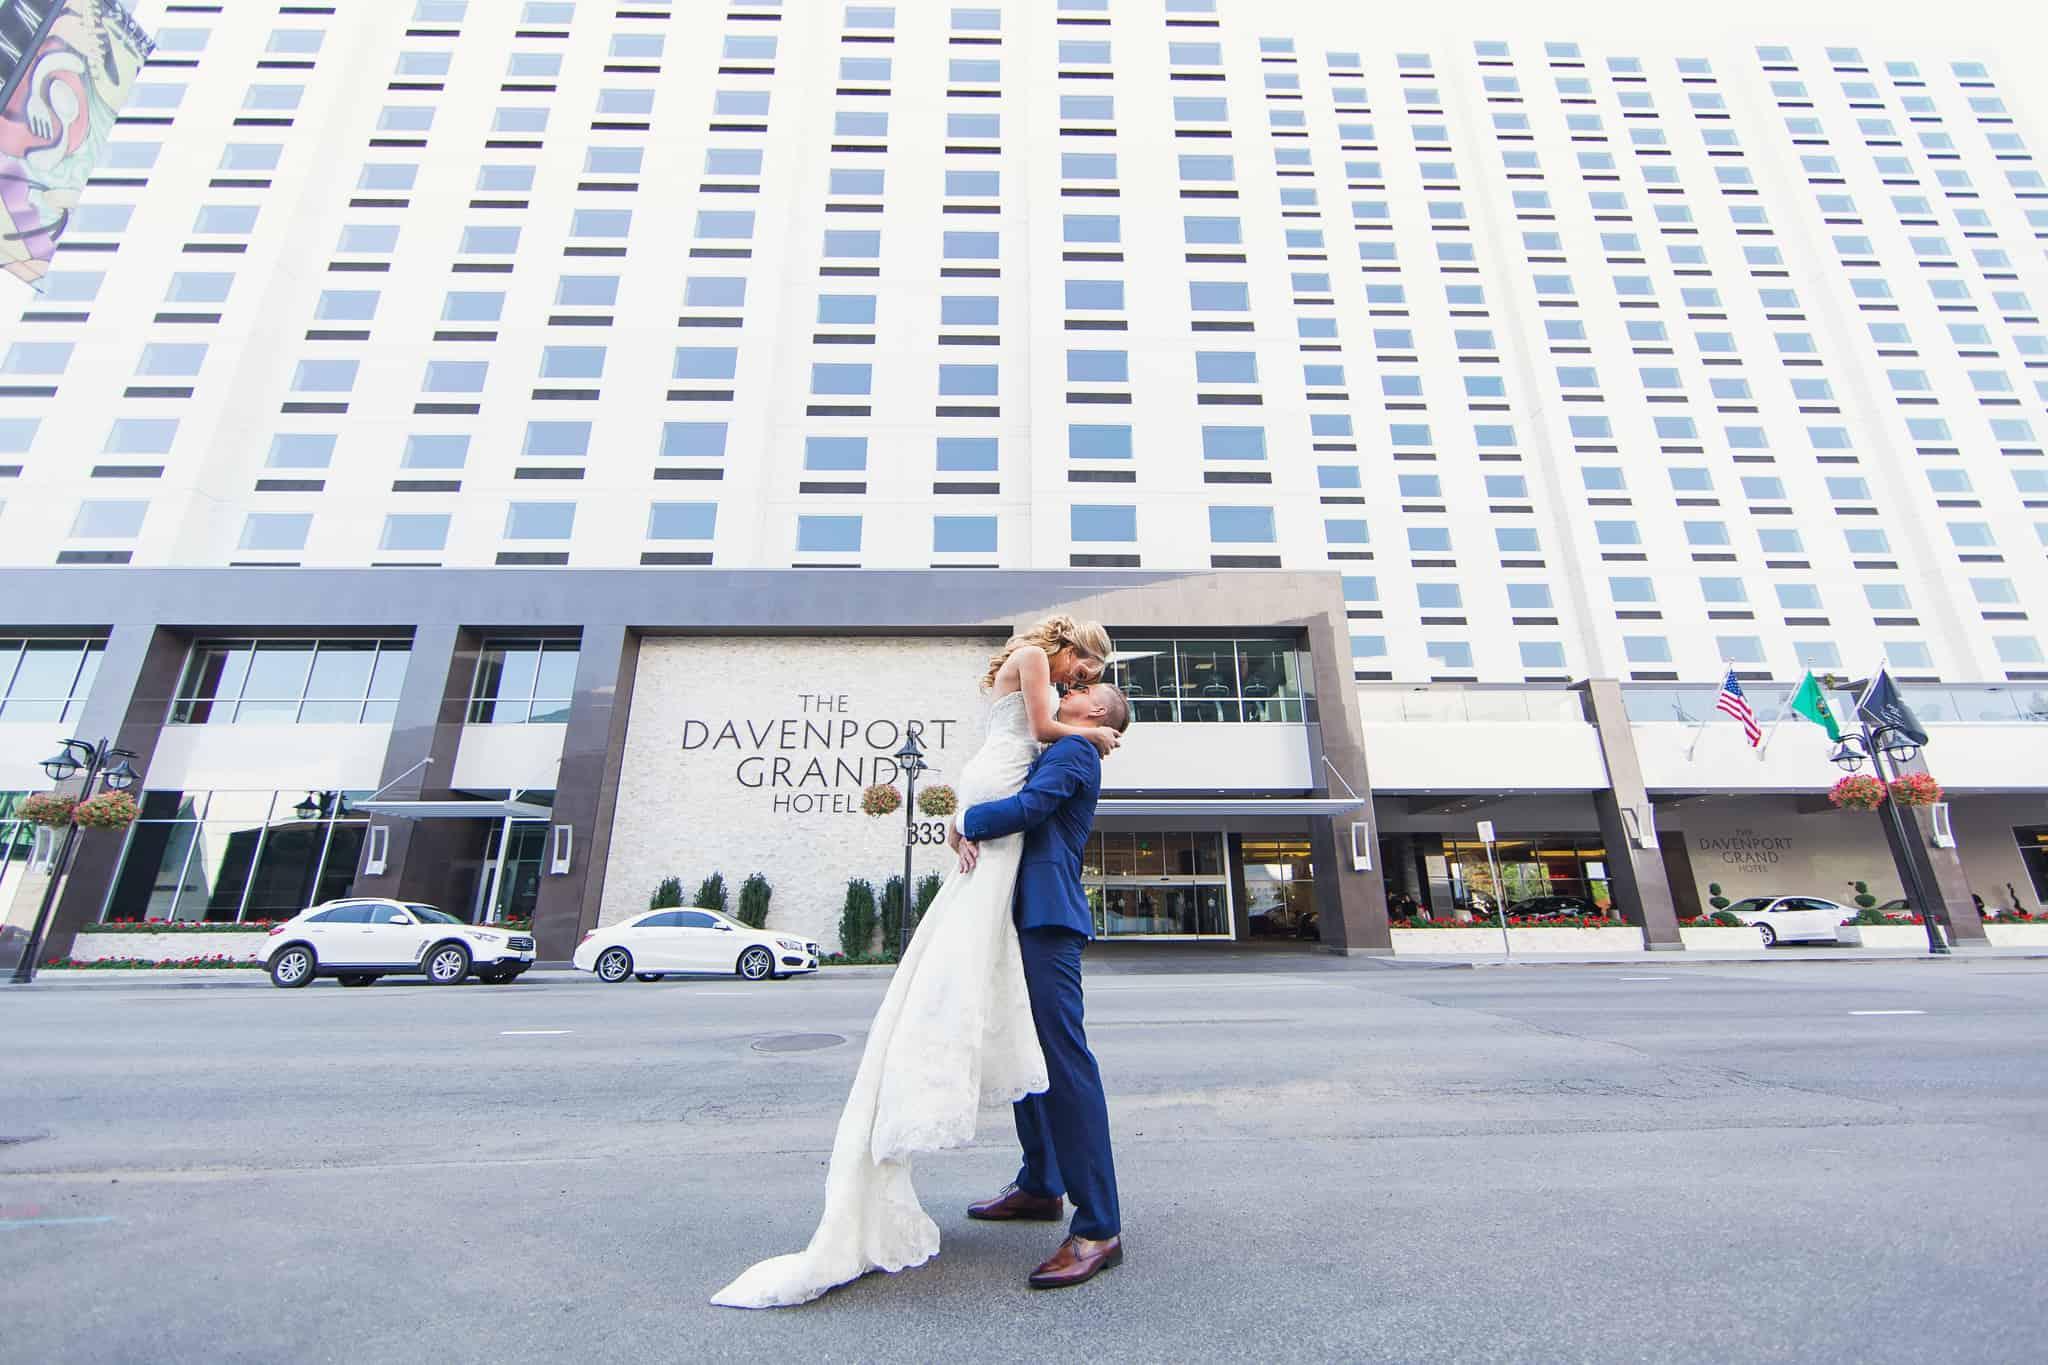 Davenport Grand Outside Wedding Couple